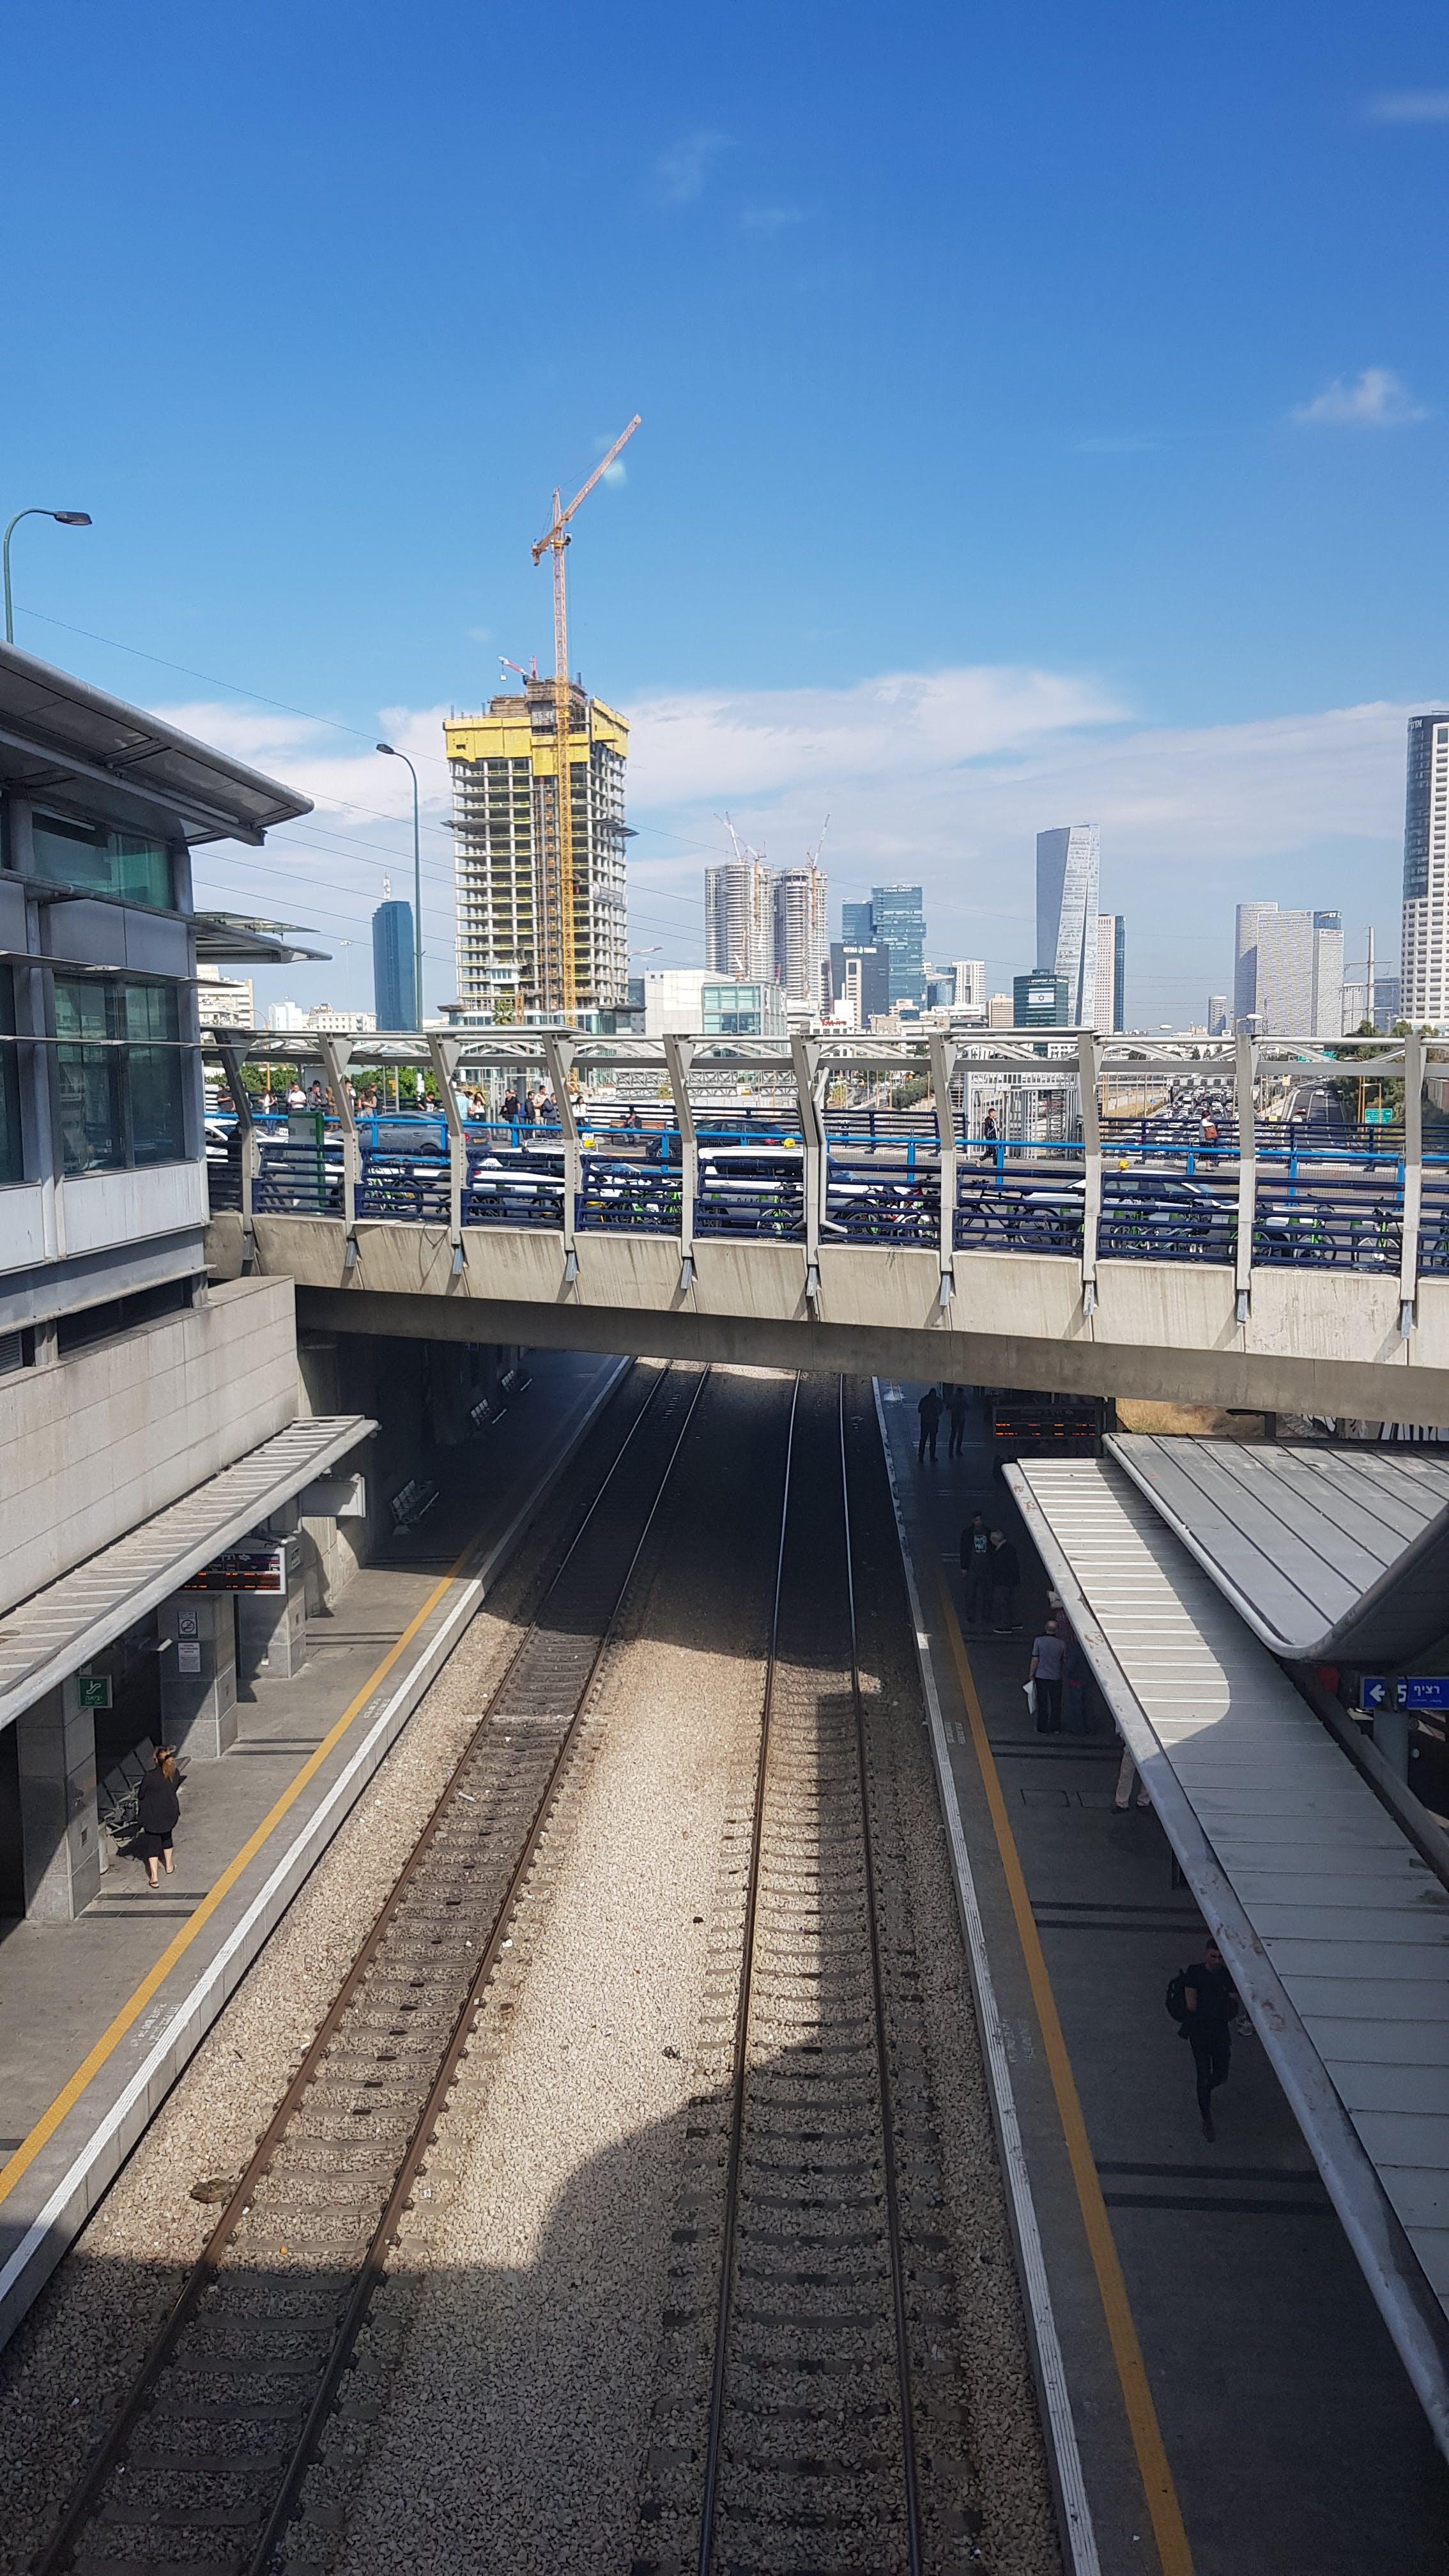 Free stock photo of Israel, tel aviv, train station